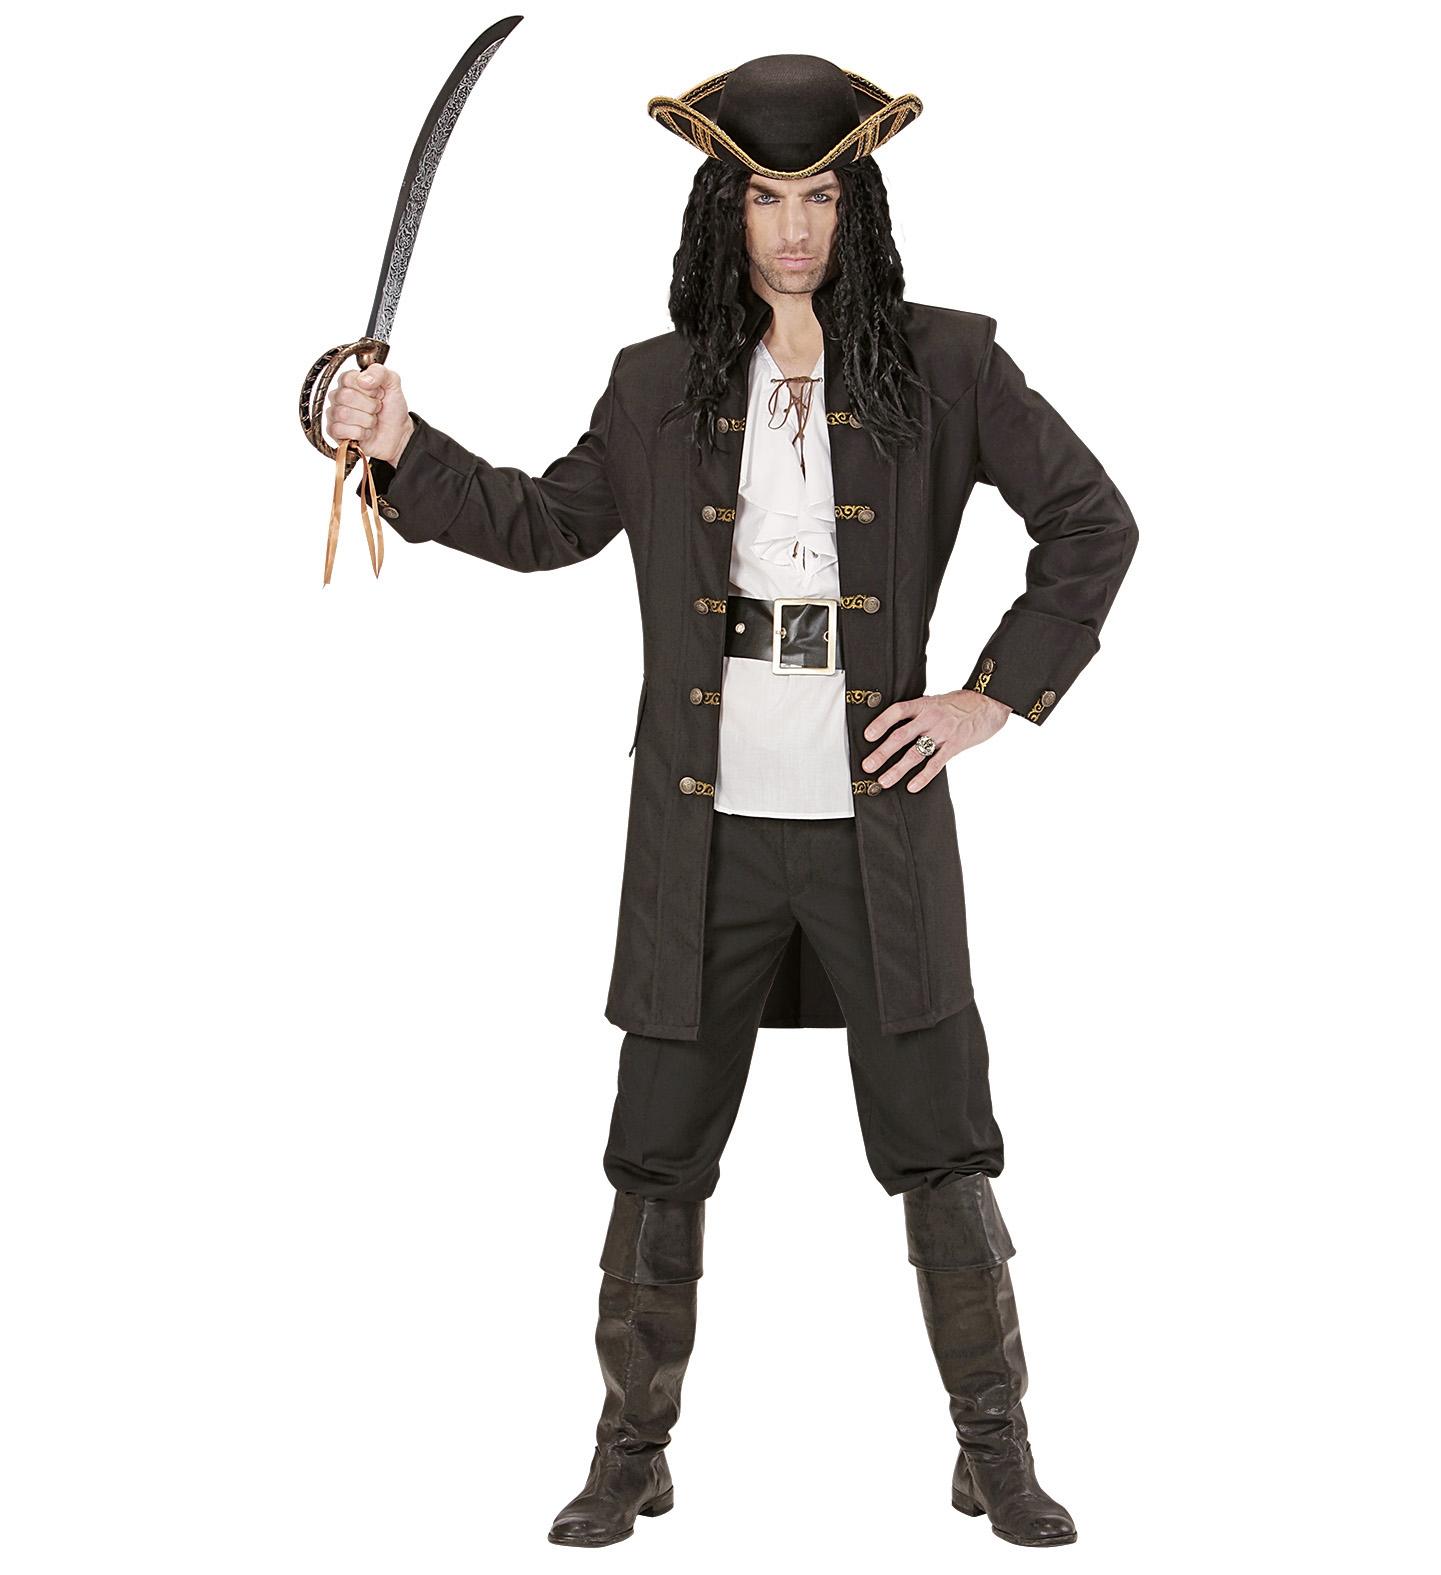 Capitaine Pirate Costume Homme Pirate Pirate Boucanier Costume Uniforme Manteau